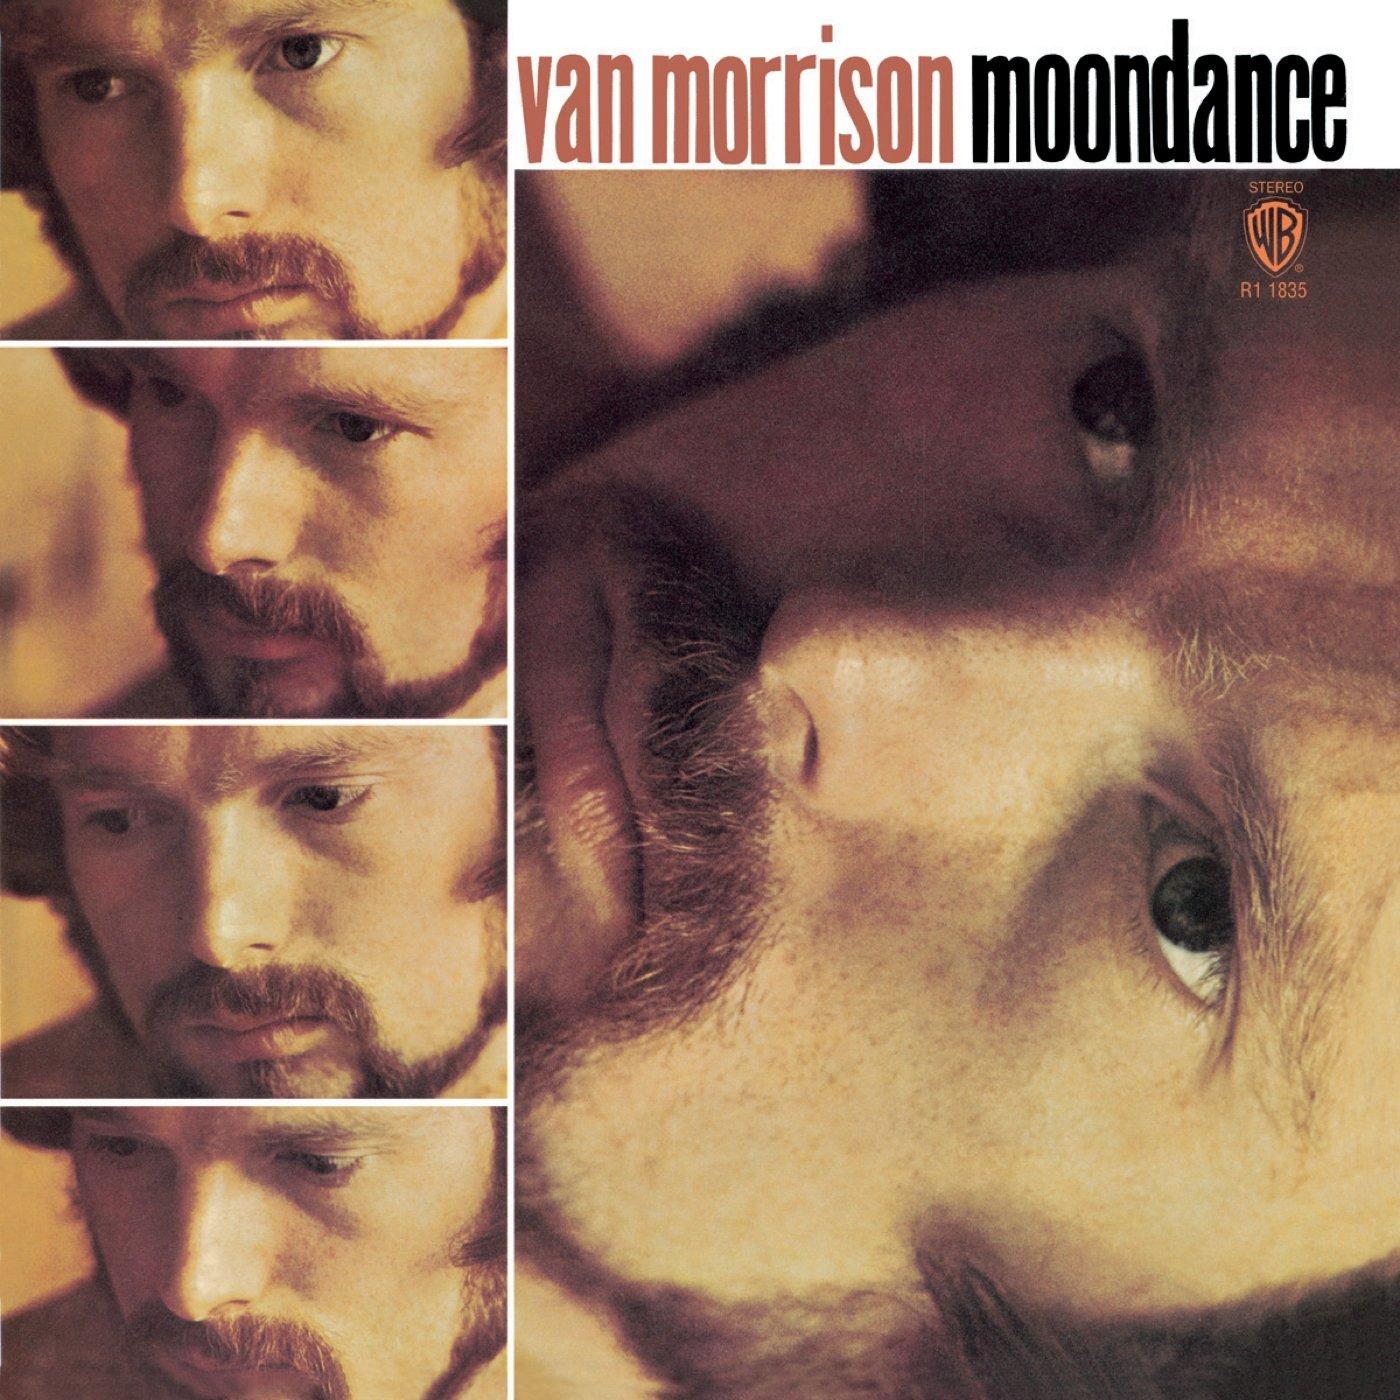 Moondance [Vinyl] by WEA